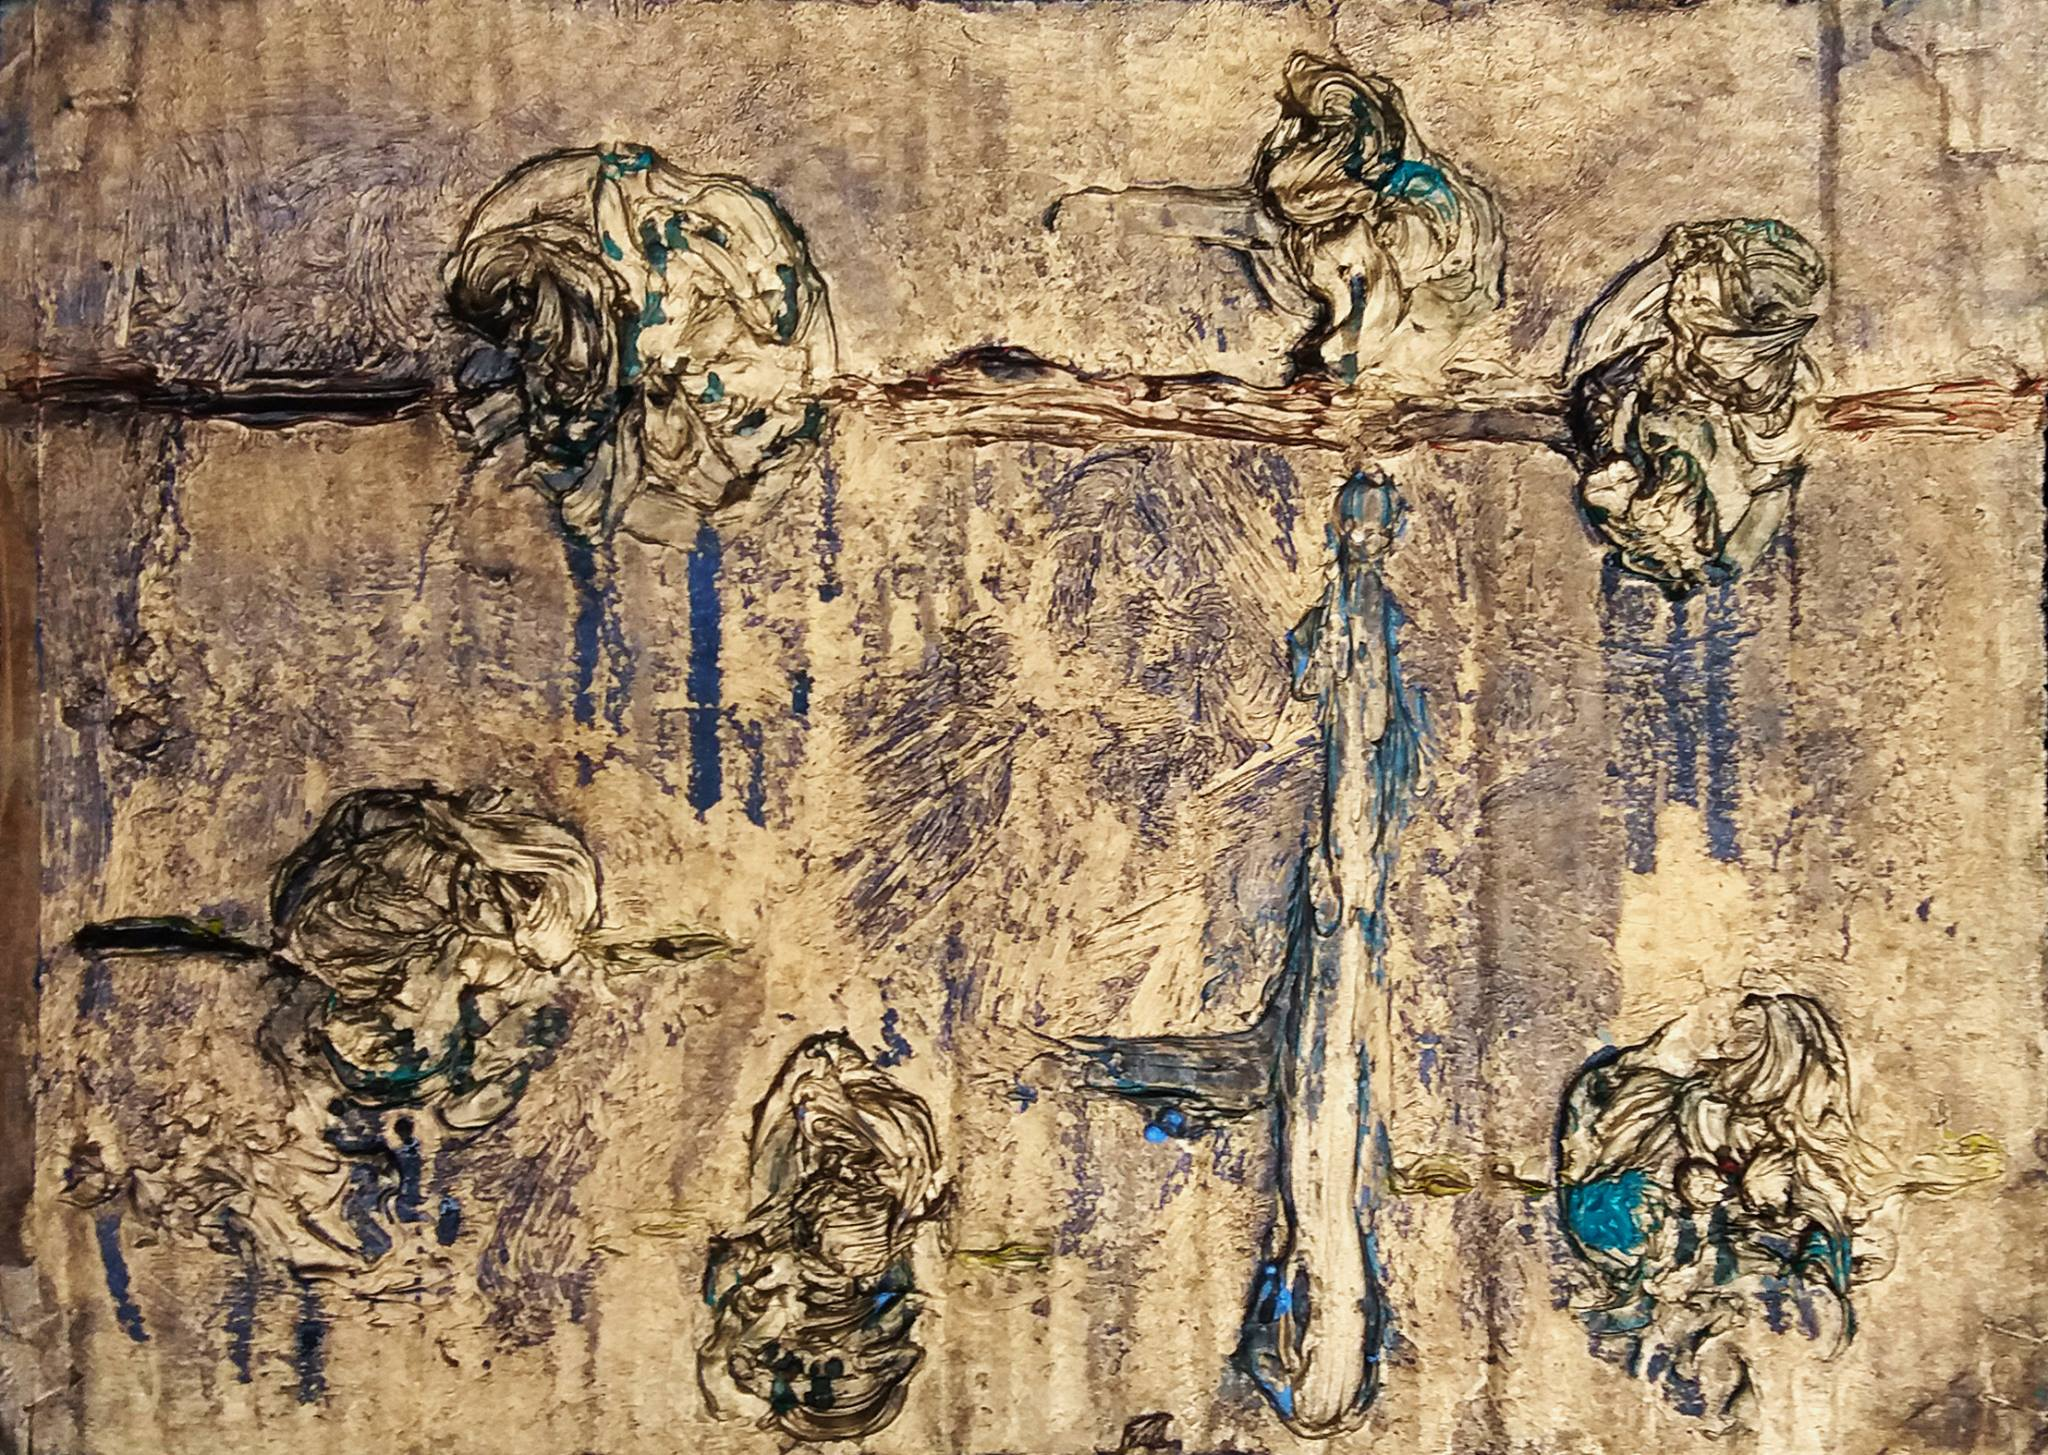 Michele PRINCIPATO TROSSO (1974) Italy, Cristal Flovers, 2015 Mixed media 27 x 39 cm